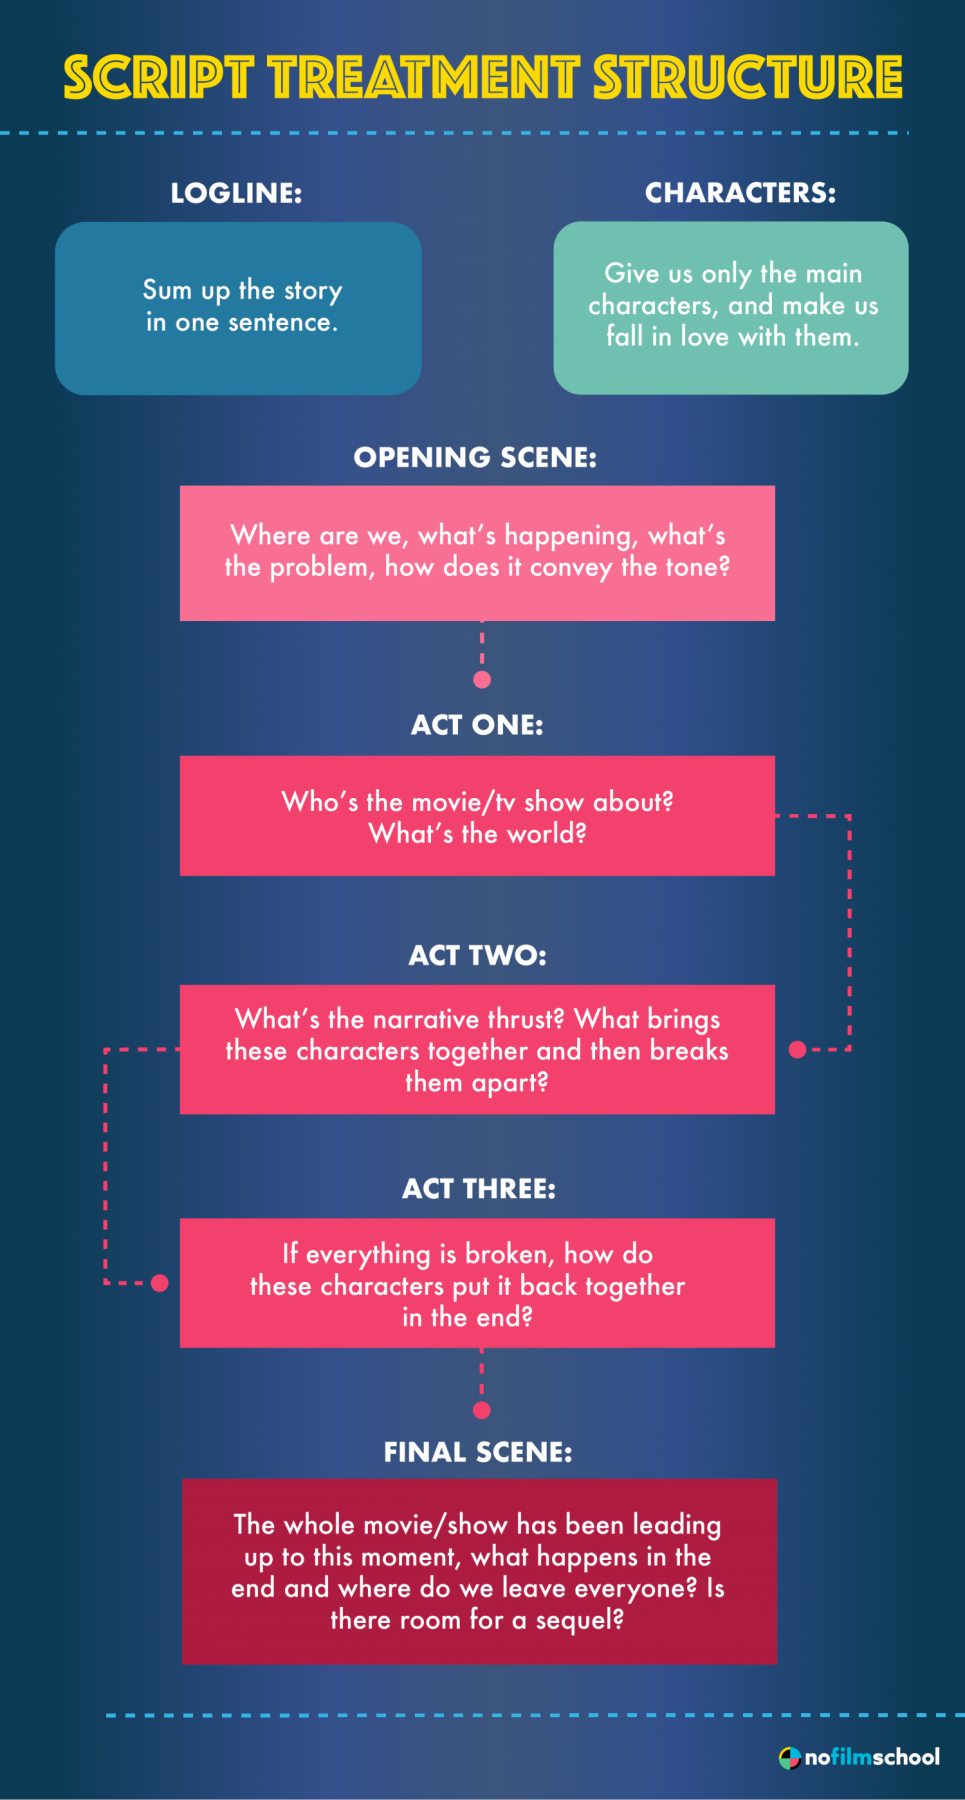 How to write a film treatment